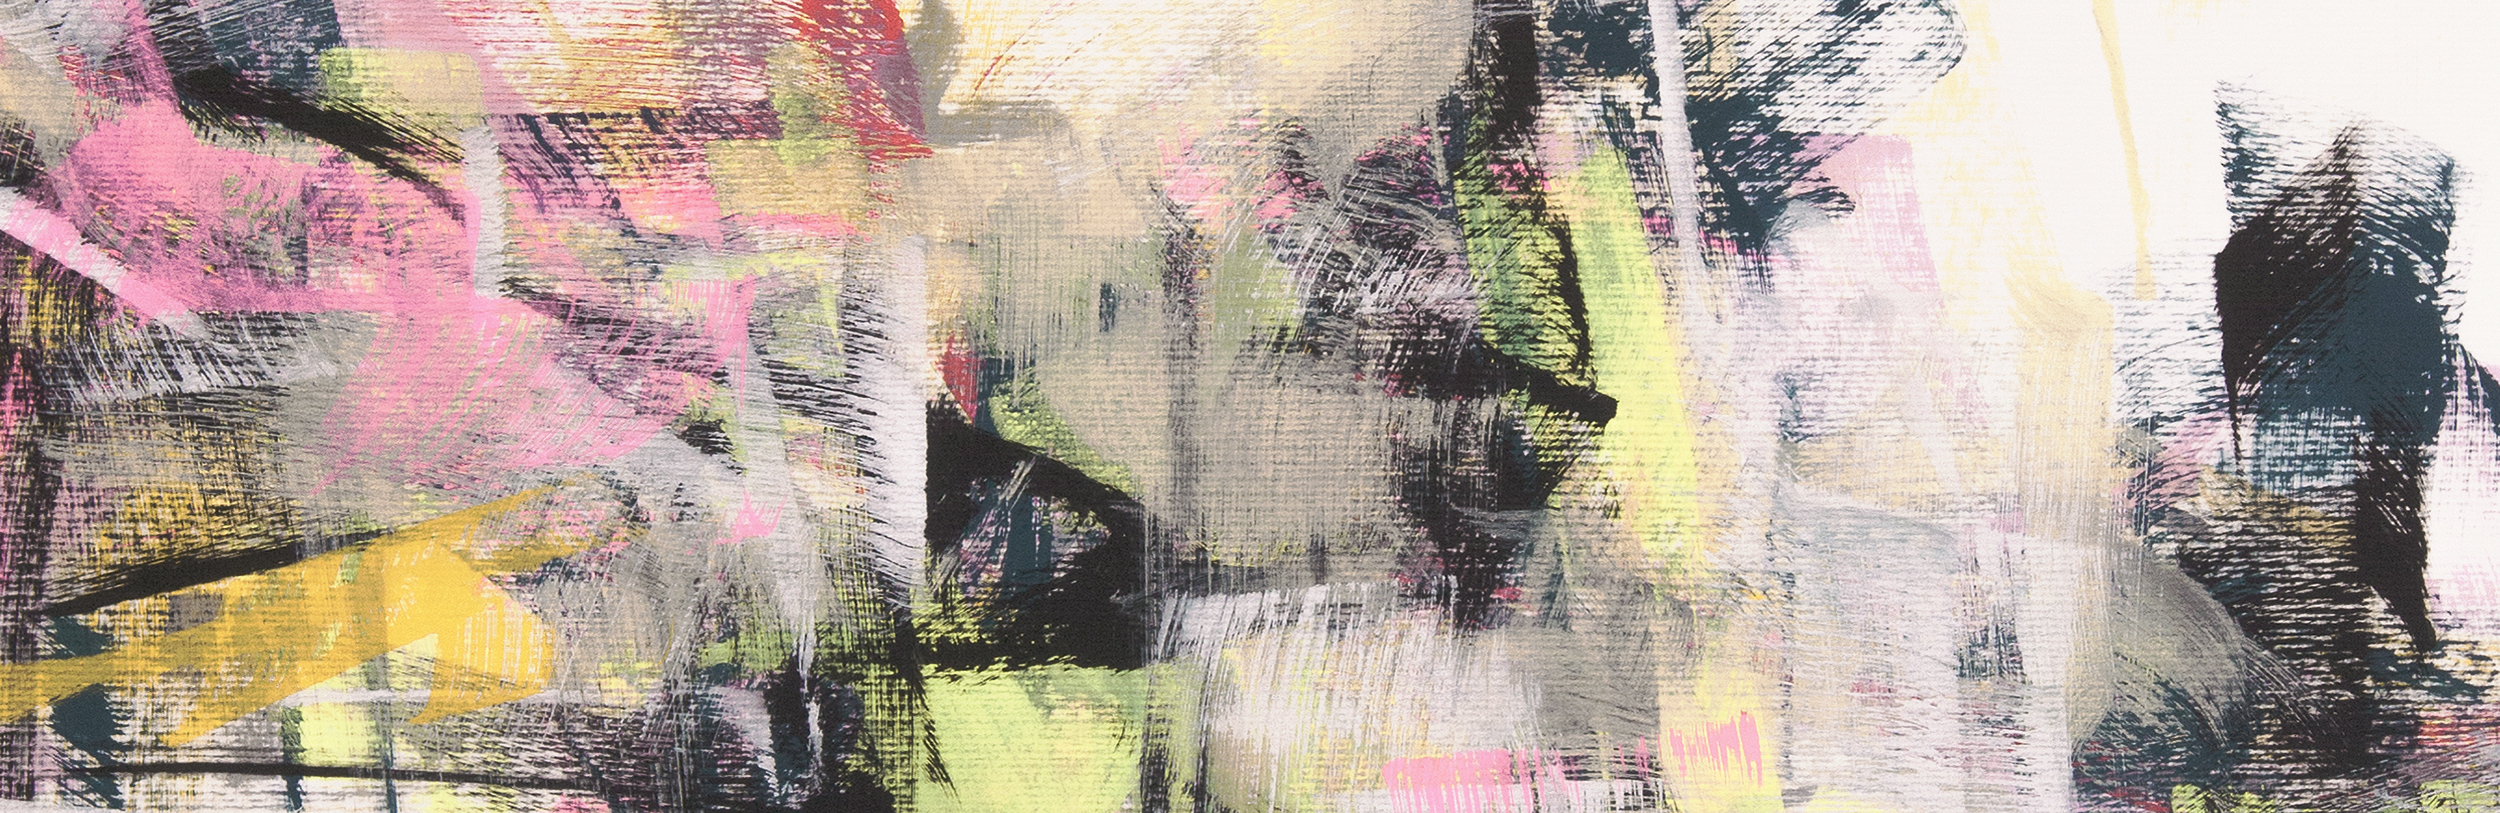 bonjourmolotov+Porto+Illustration+Ilustracao+painting+pintura+acrylic+acrílico+canvas+tela+paper+cardboard+mdf+Andre+Gigante+09N7.jpg